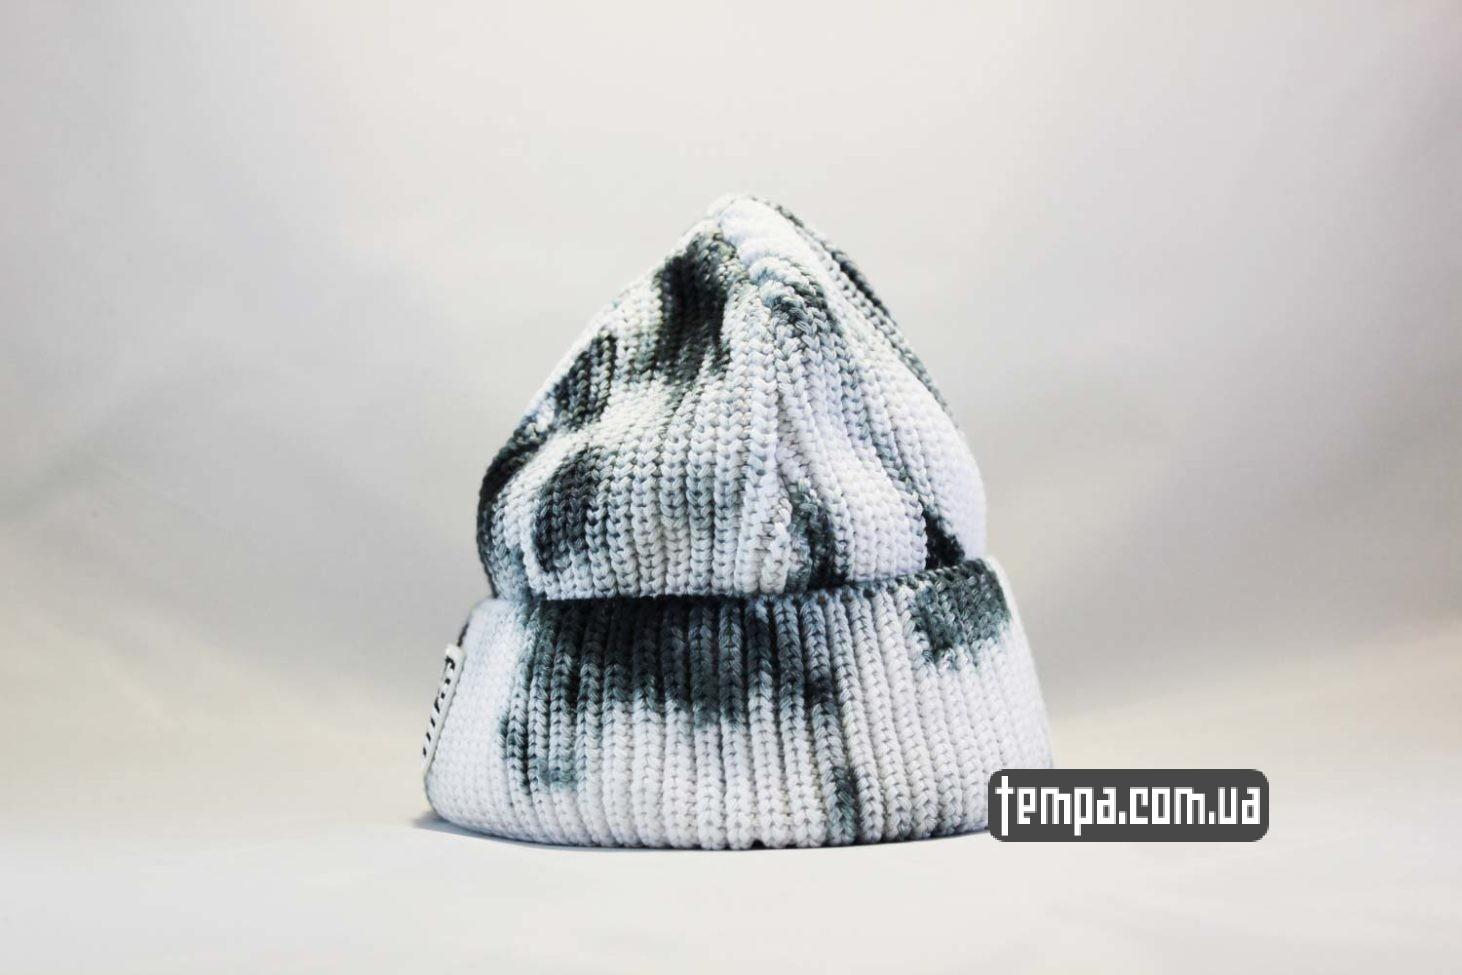 spot шапка beanie Carhartt пятнистая черно-белая